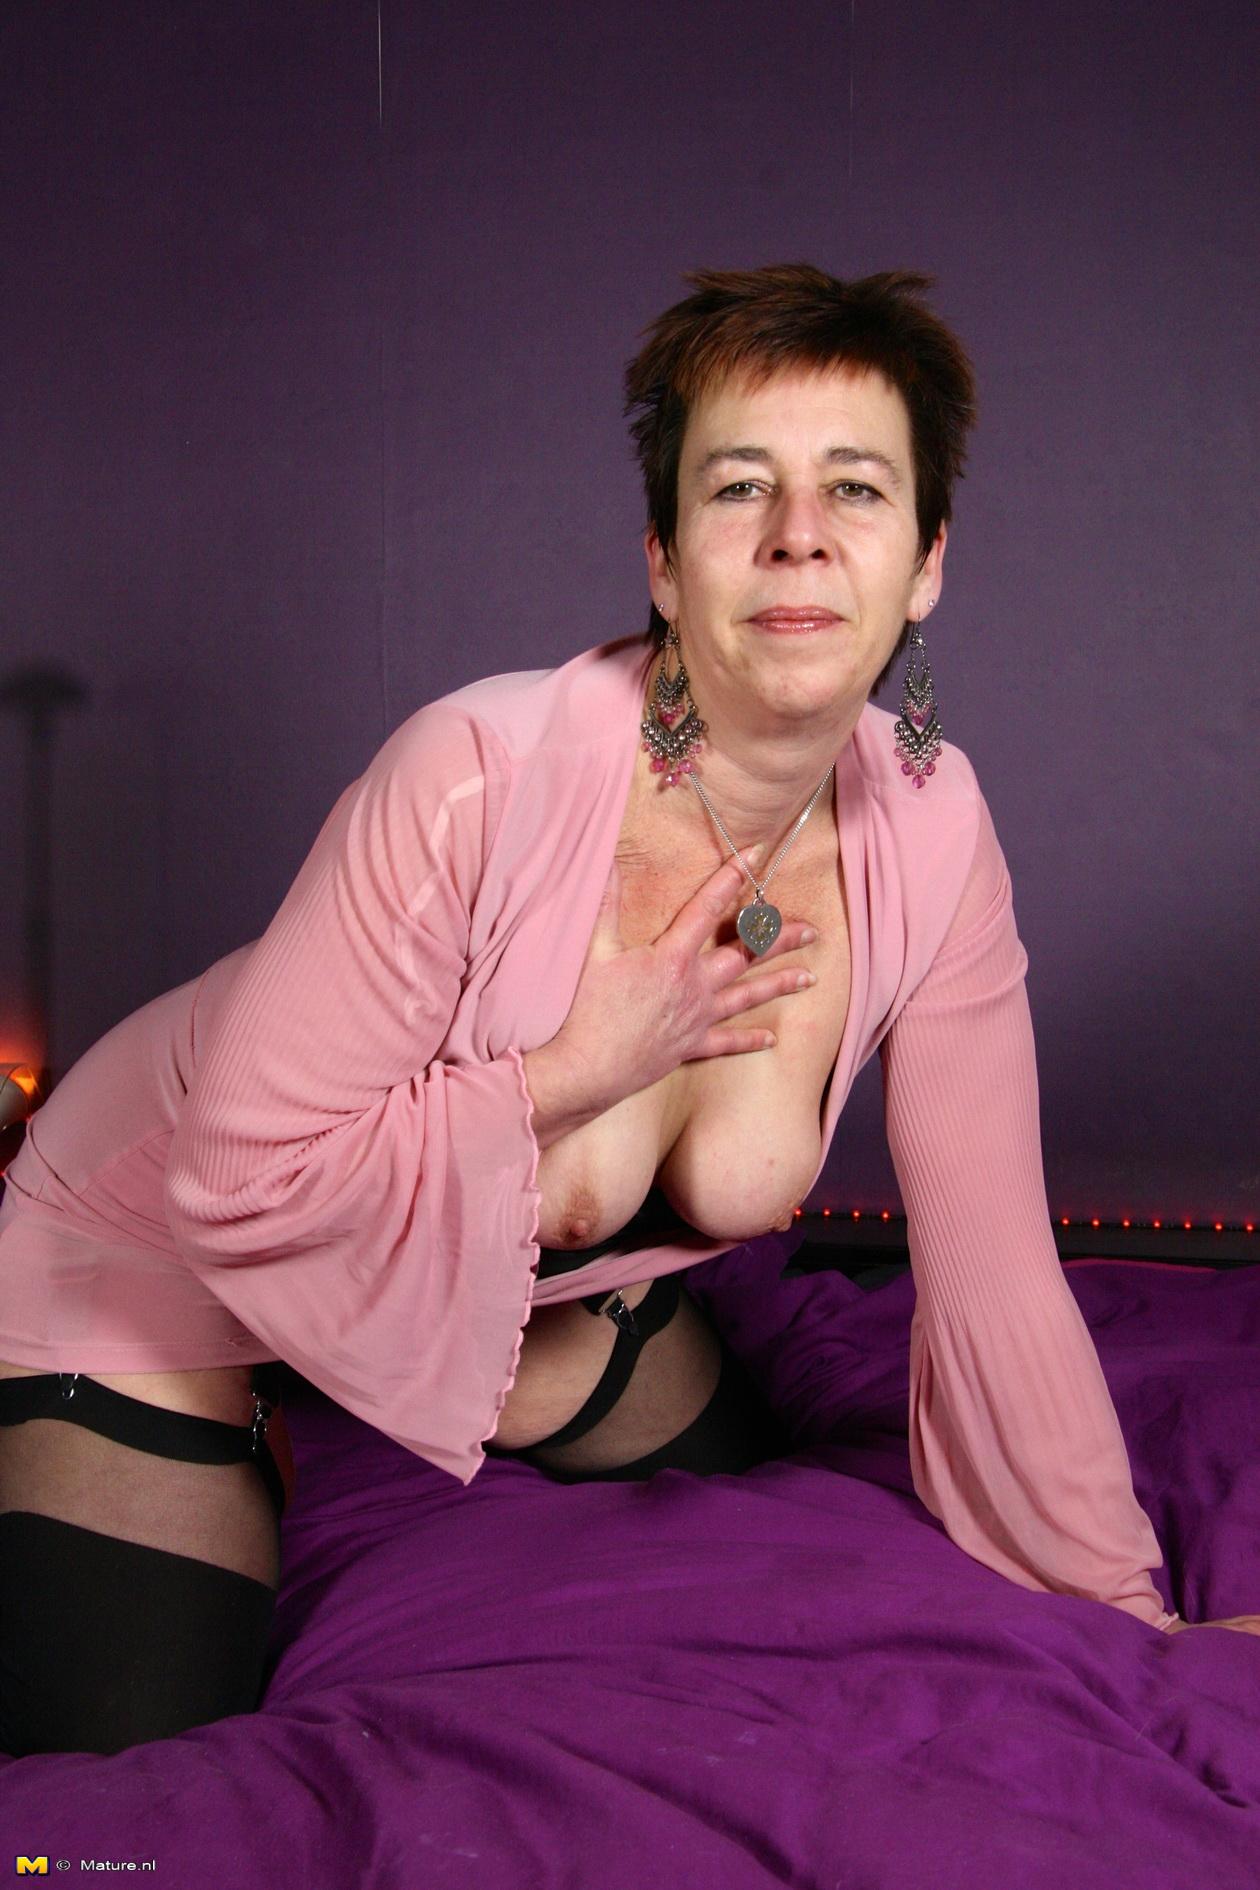 Naughty Dutch Mature Slut Getting Wet